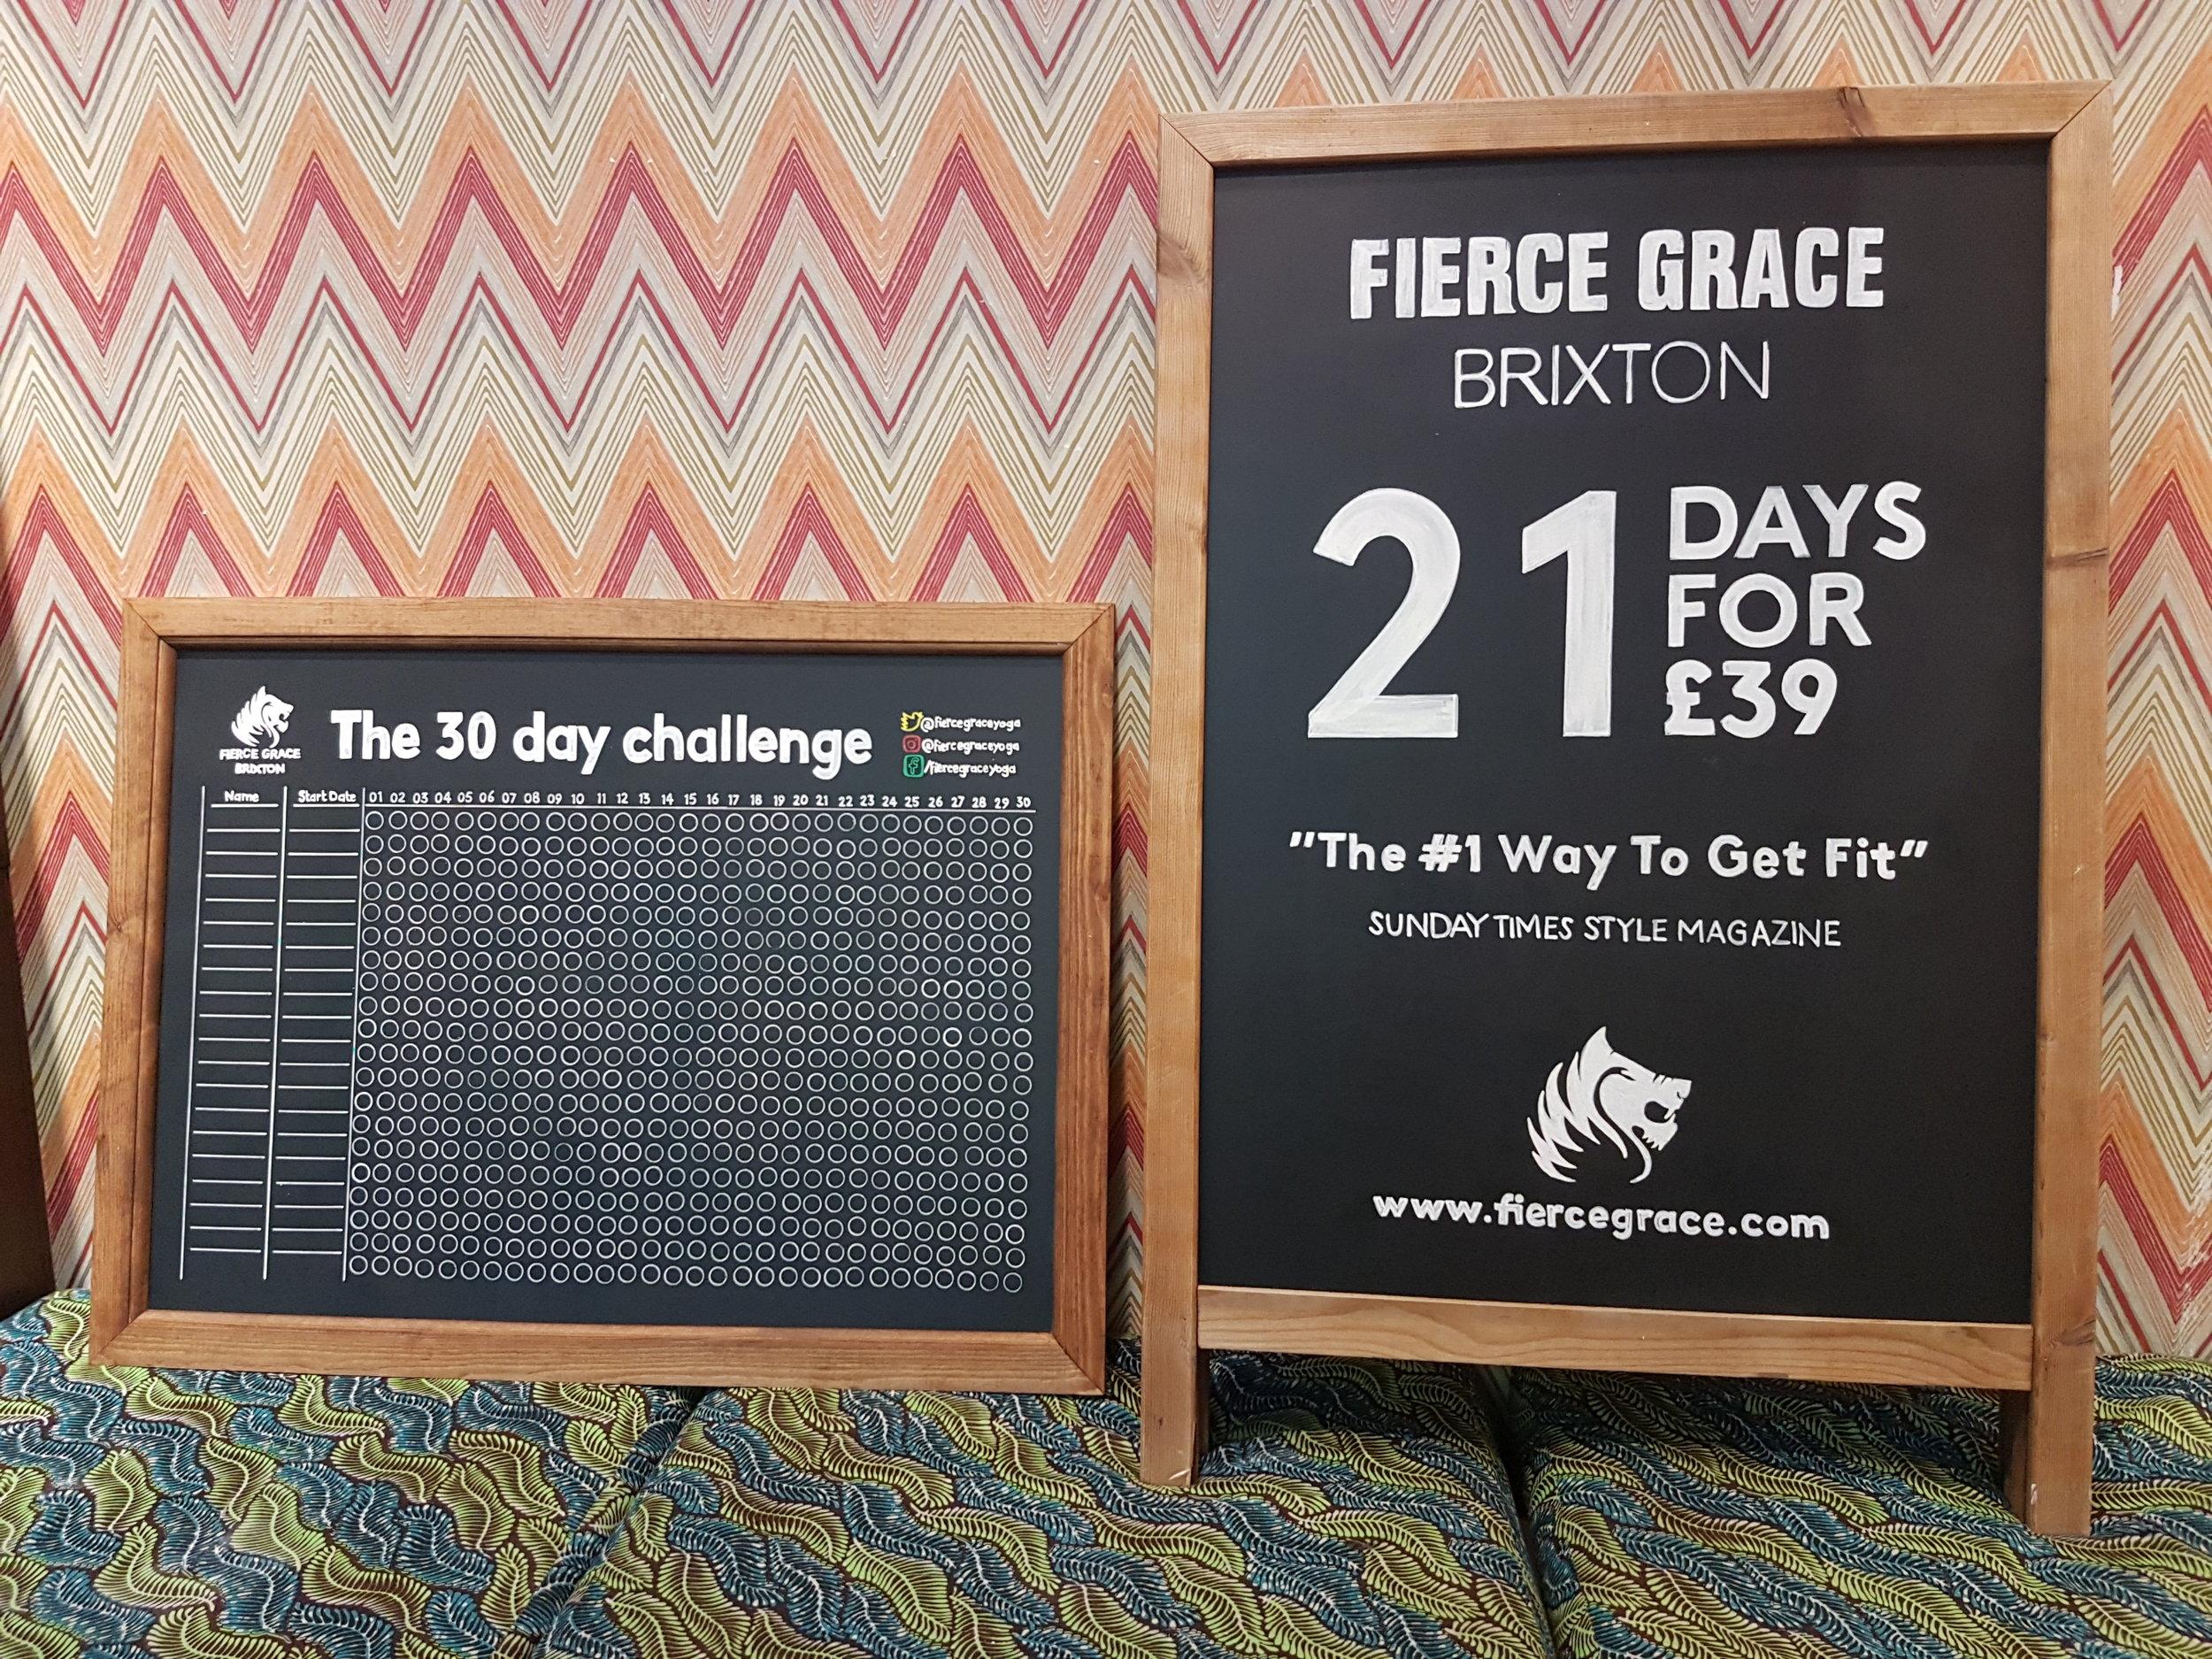 30 day challenge Brixton Fierce Grace